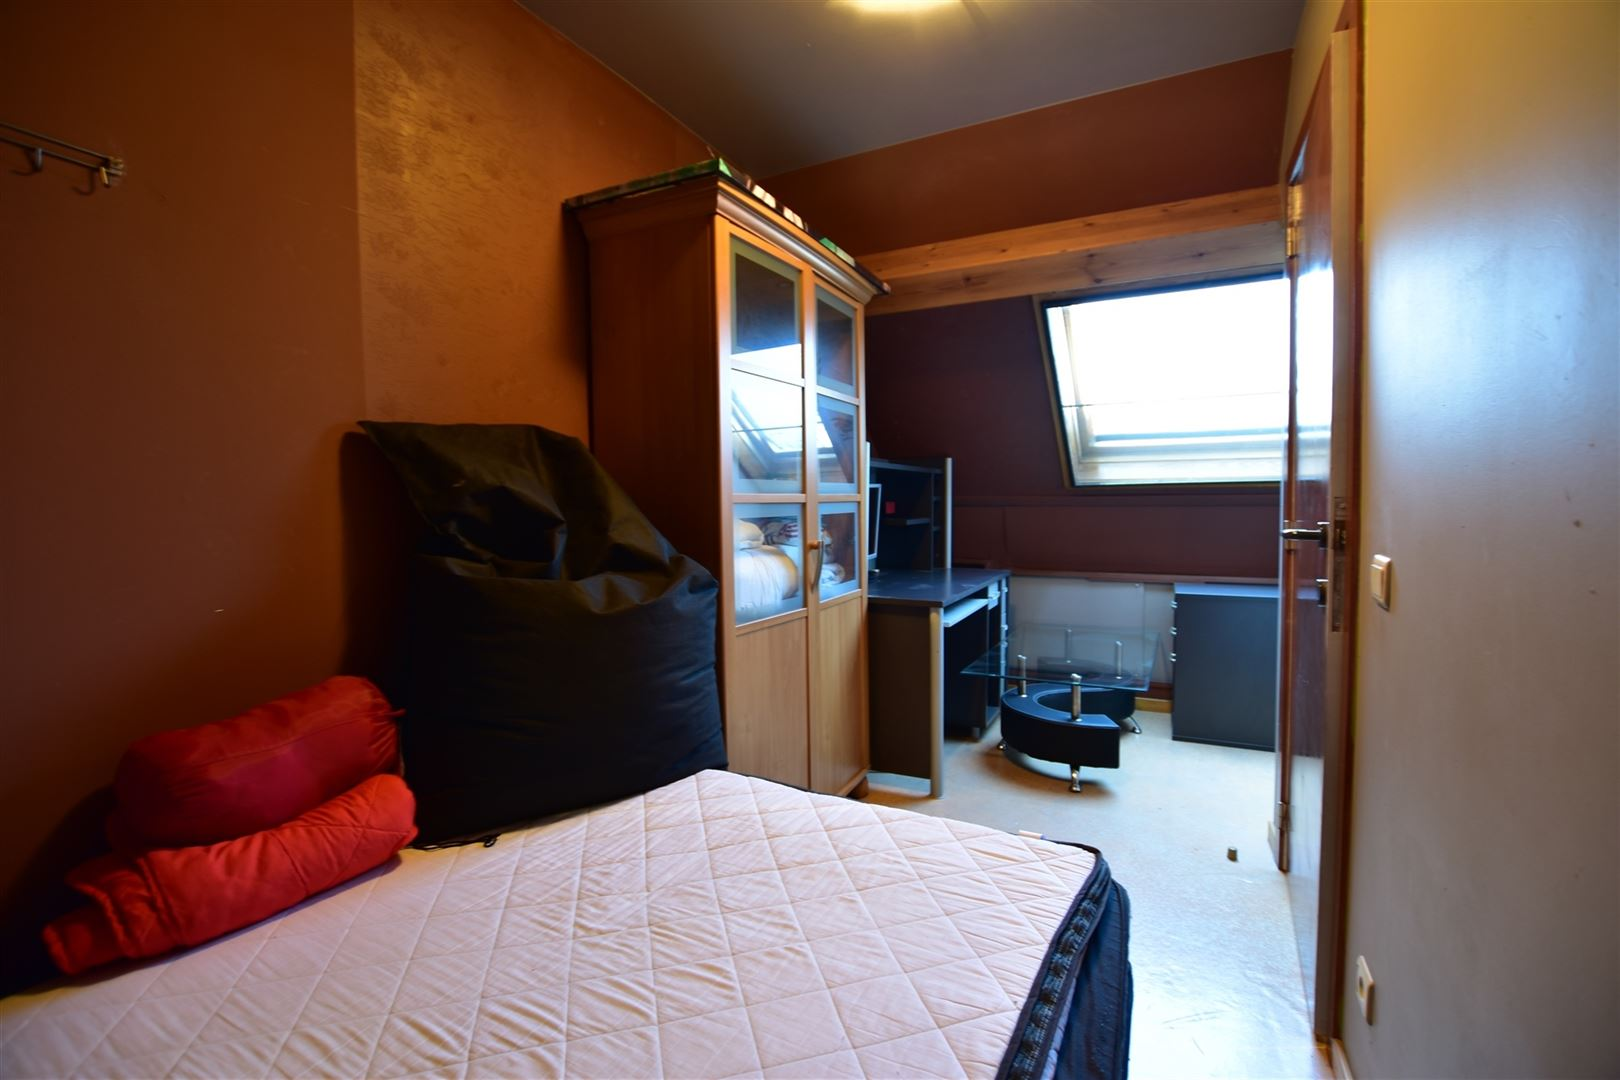 Foto 14 : Duplex/triplex te 9200 BAASRODE (België) - Prijs € 159.000